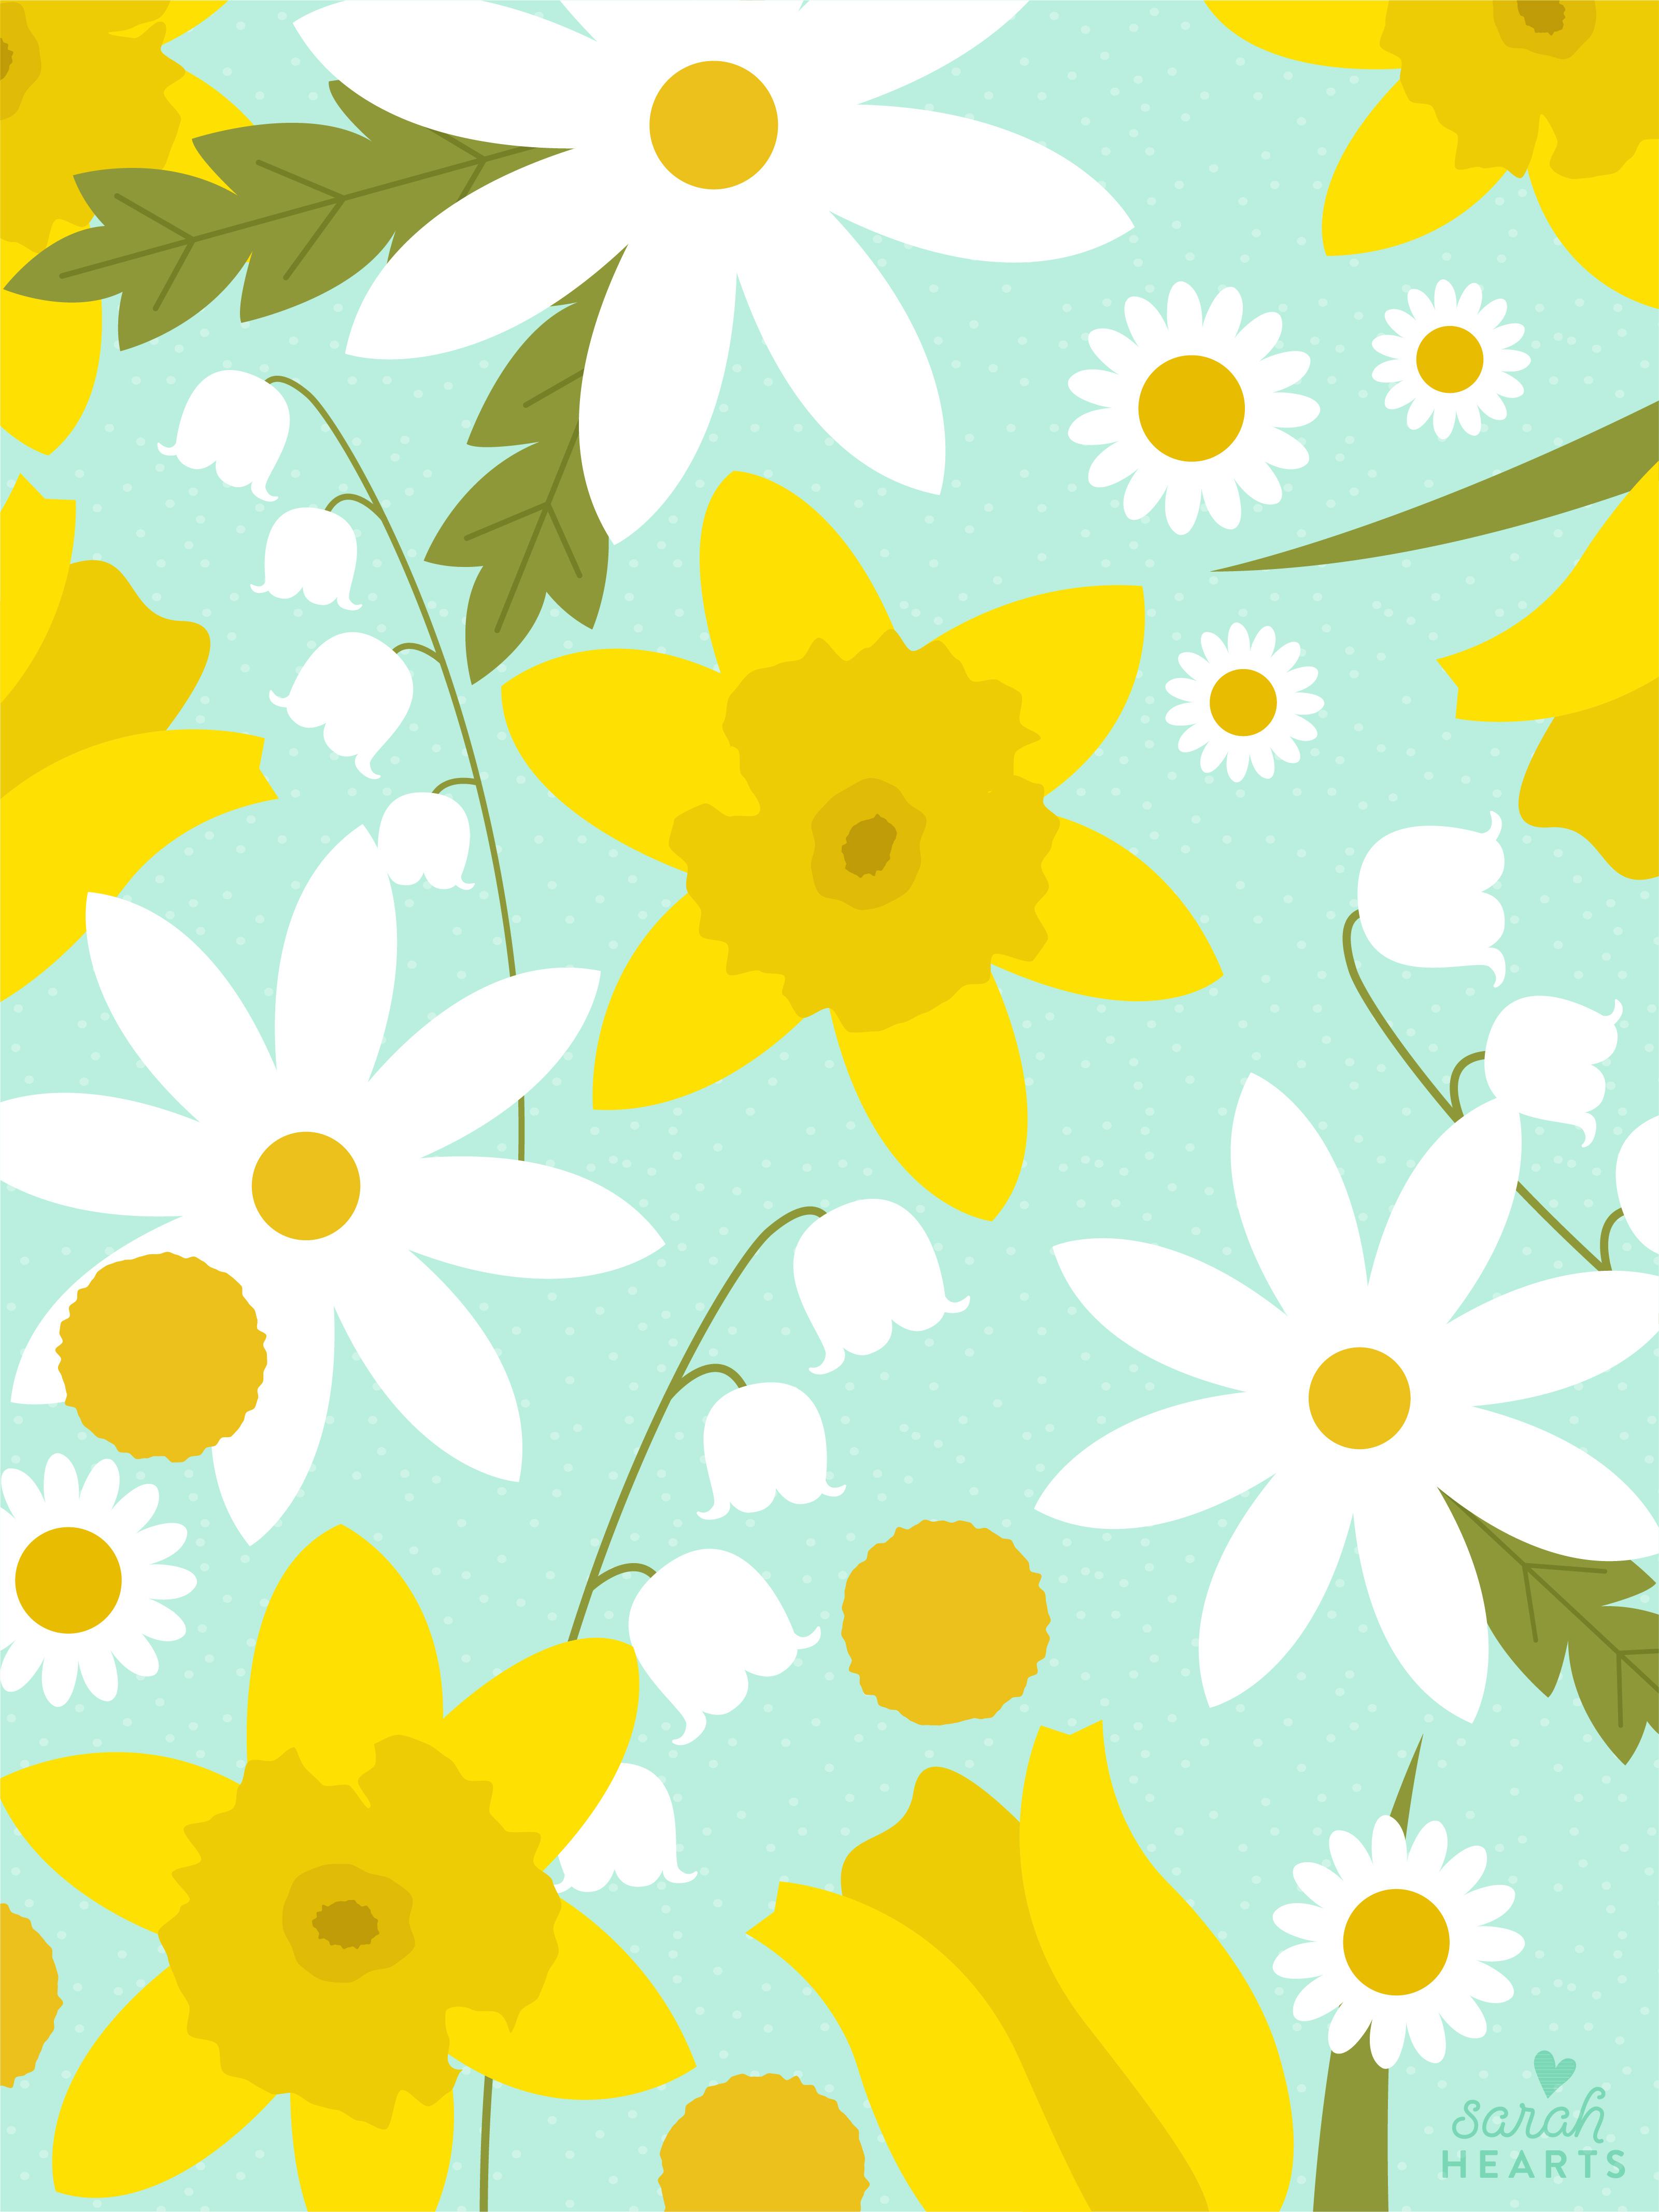 Lilly Iphone Wallpaper March 2018 Spring Flower Calendar Wallpaper Sarah Hearts